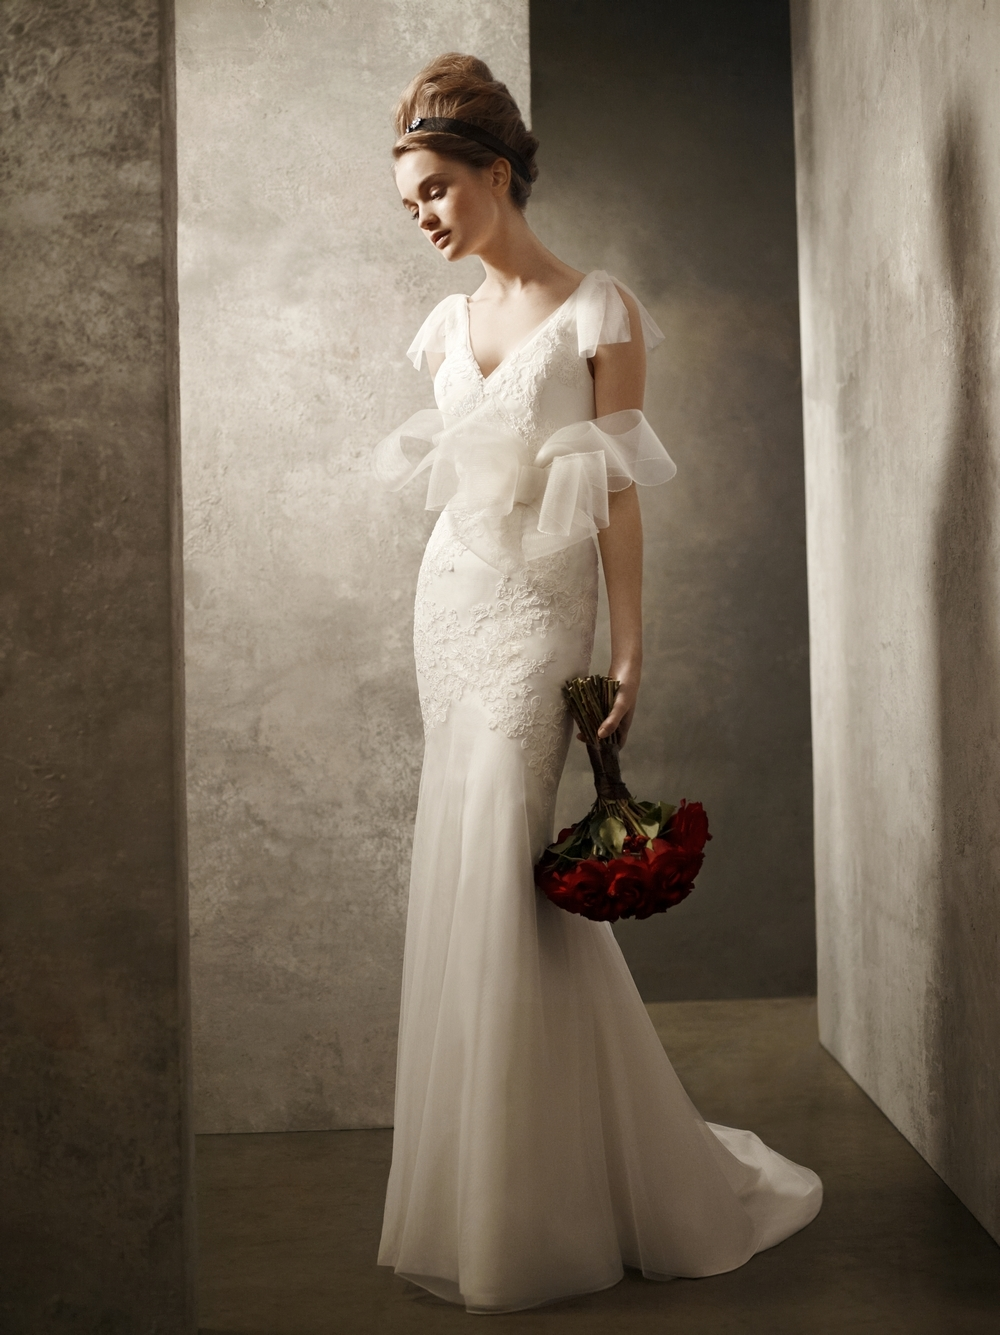 2011-wedding-dresses-vera-wang-white-vw351021-lace-v-neck-mermaid-bridal-gown.full